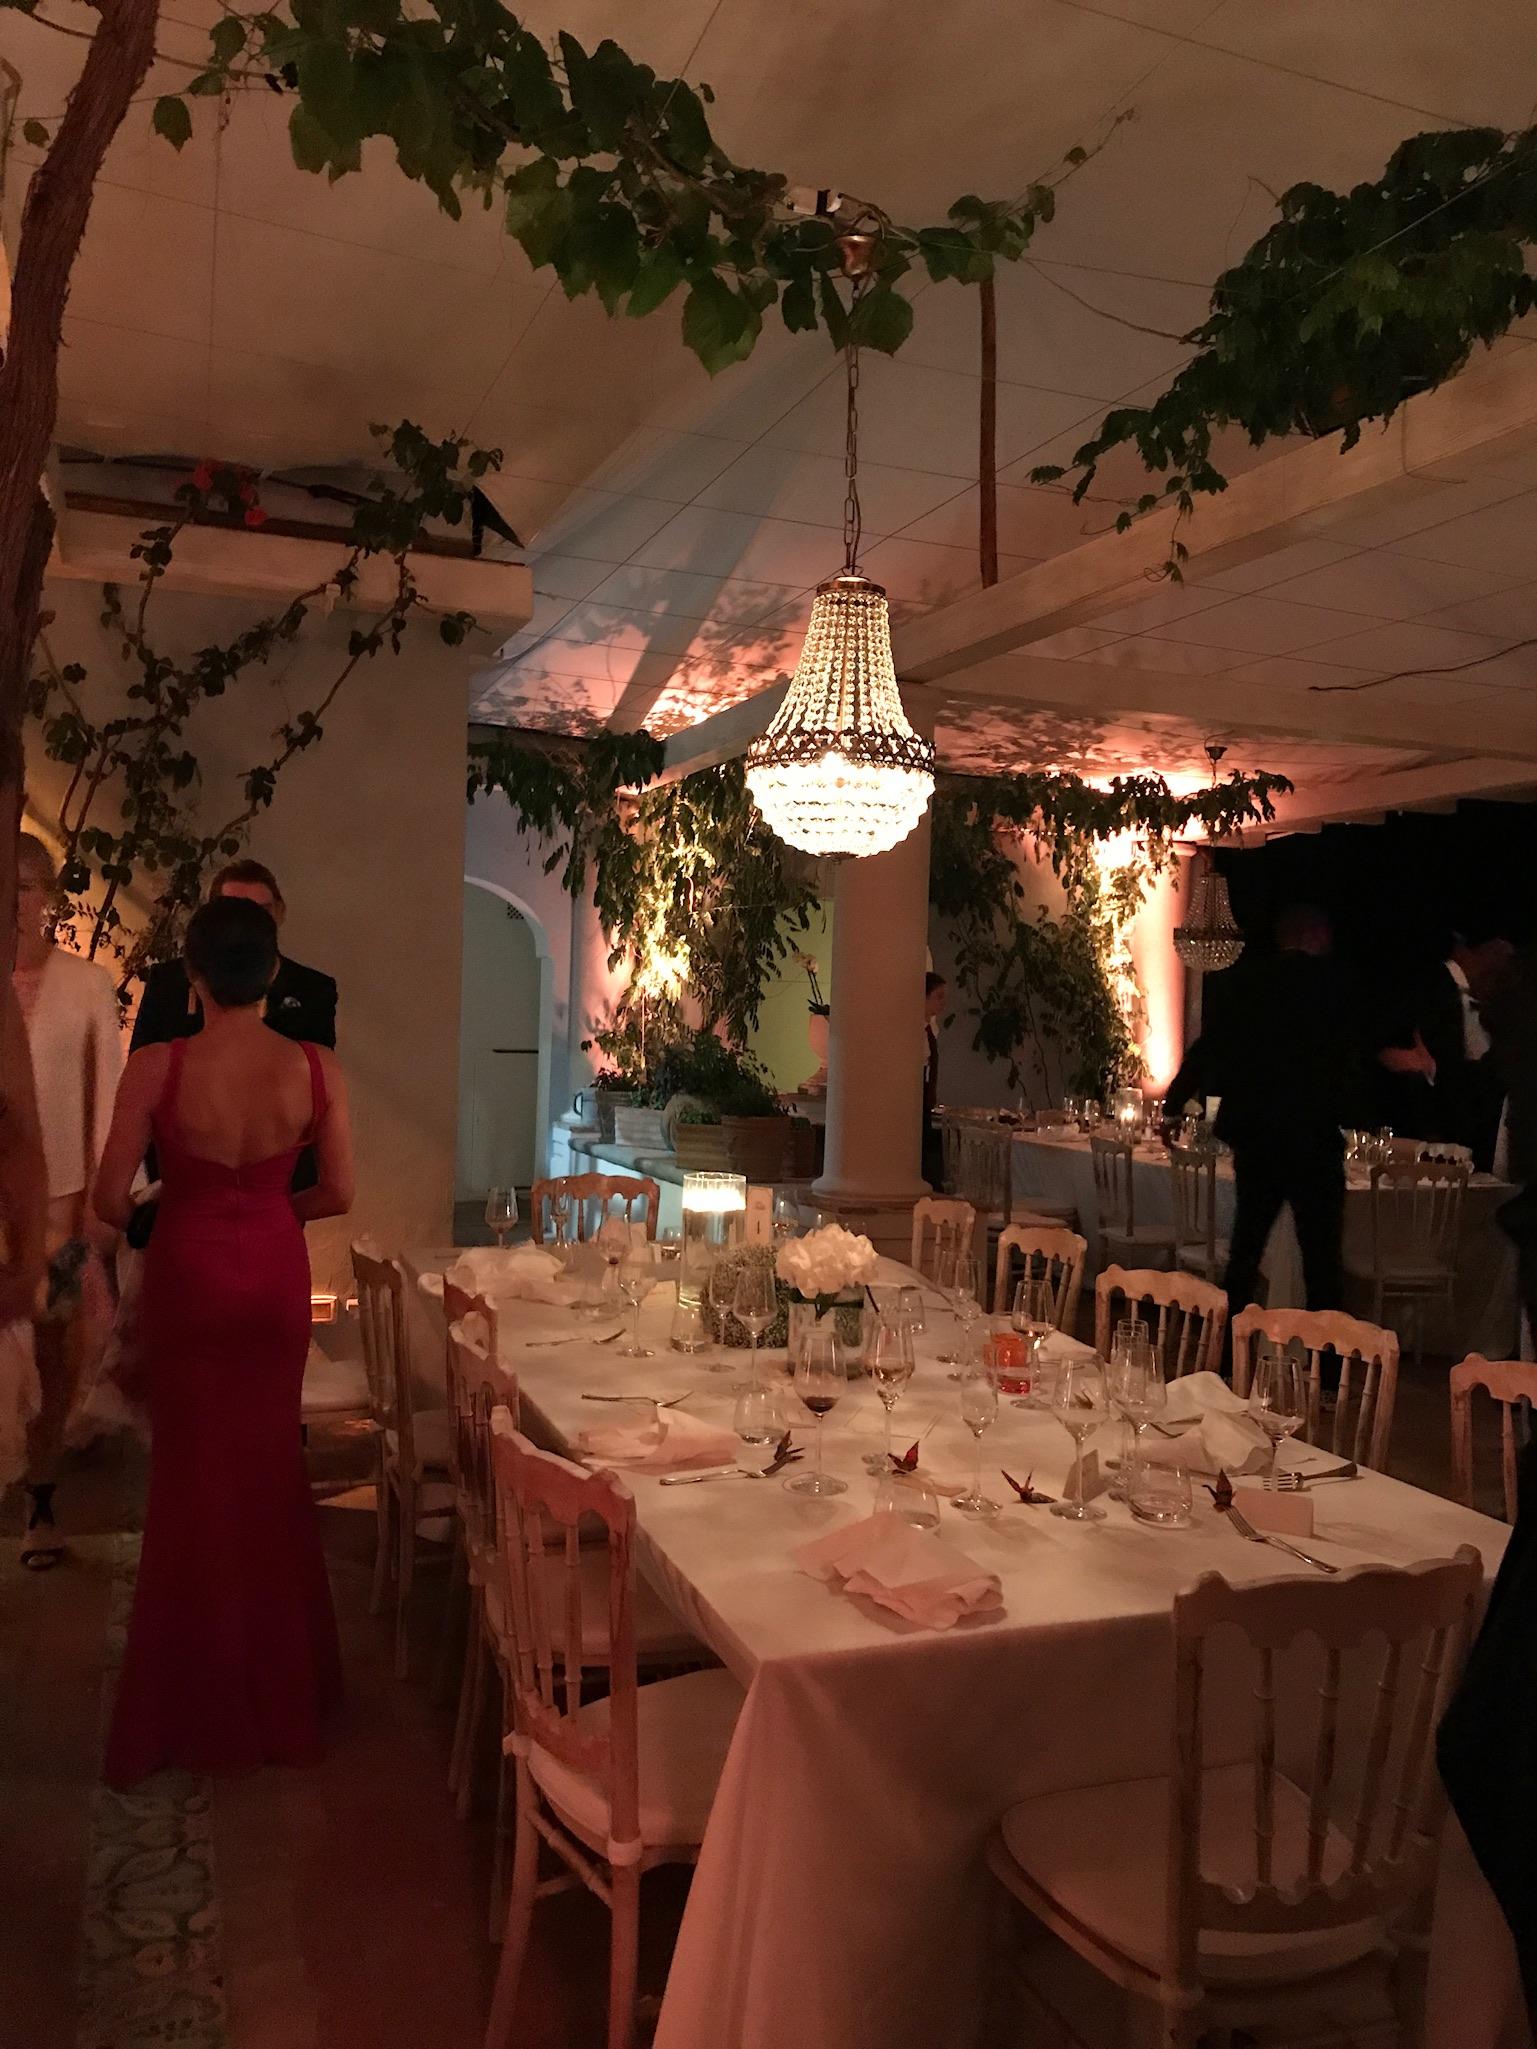 https://www.weddingamalfi.com/wp-content/uploads/Nathalie-and-Benjamin-wedding-in-Positano-21.jpg